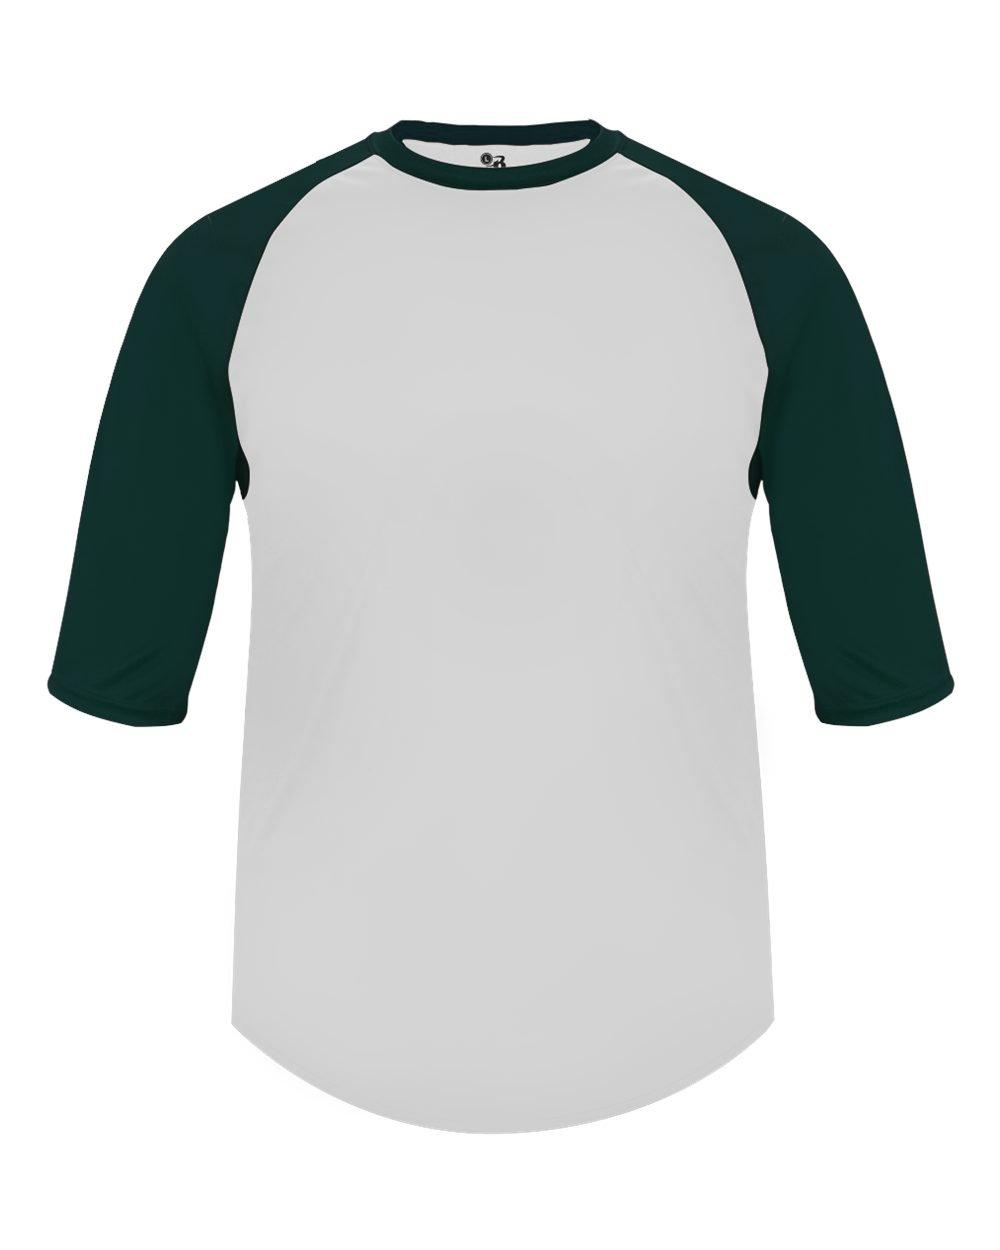 ad650c7d Amazon.com : Baseball & Softball Raglan 3/4 Sleeve Moisture Wicking  Undershirt & Practice Uniform Jersey Shirt (Youth & Adult) : Sports &  Outdoors